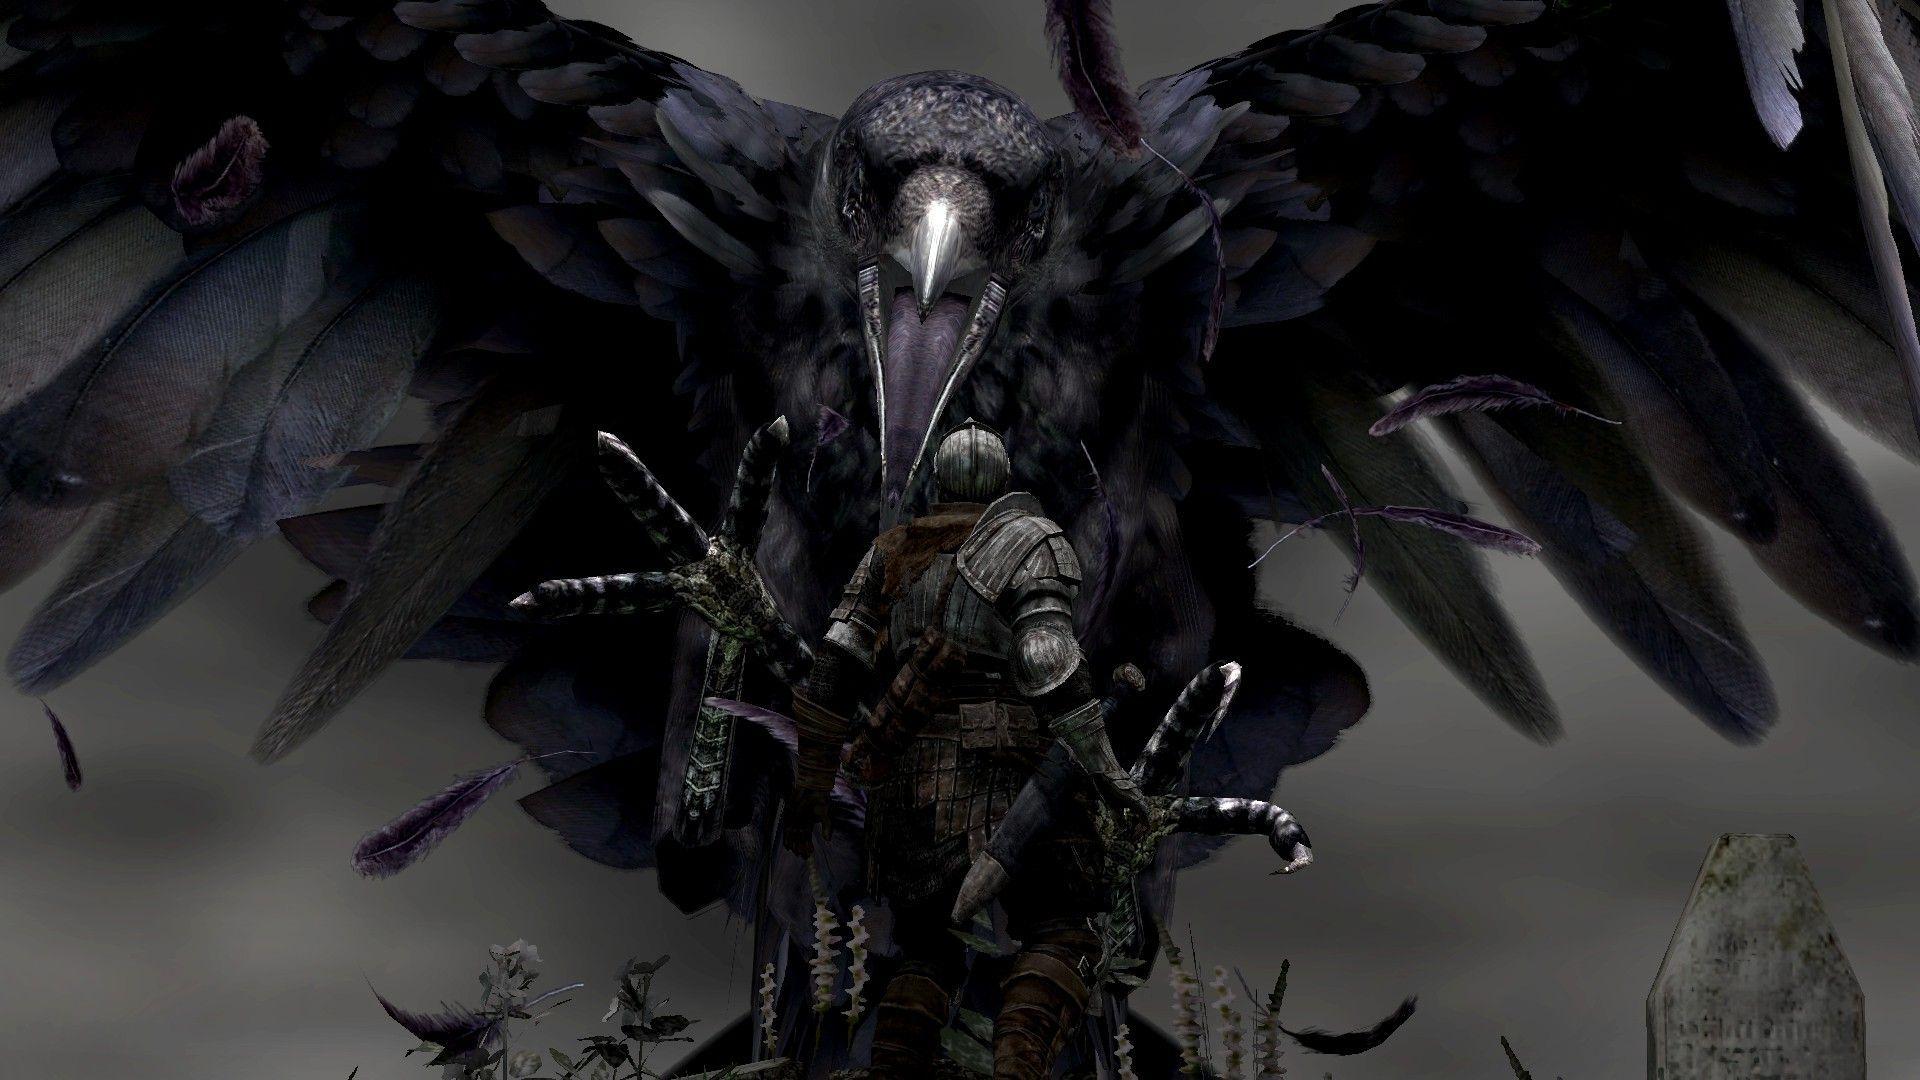 Dark Souls 2 Wallpaper Hd: Dark Souls HD Wallpapers